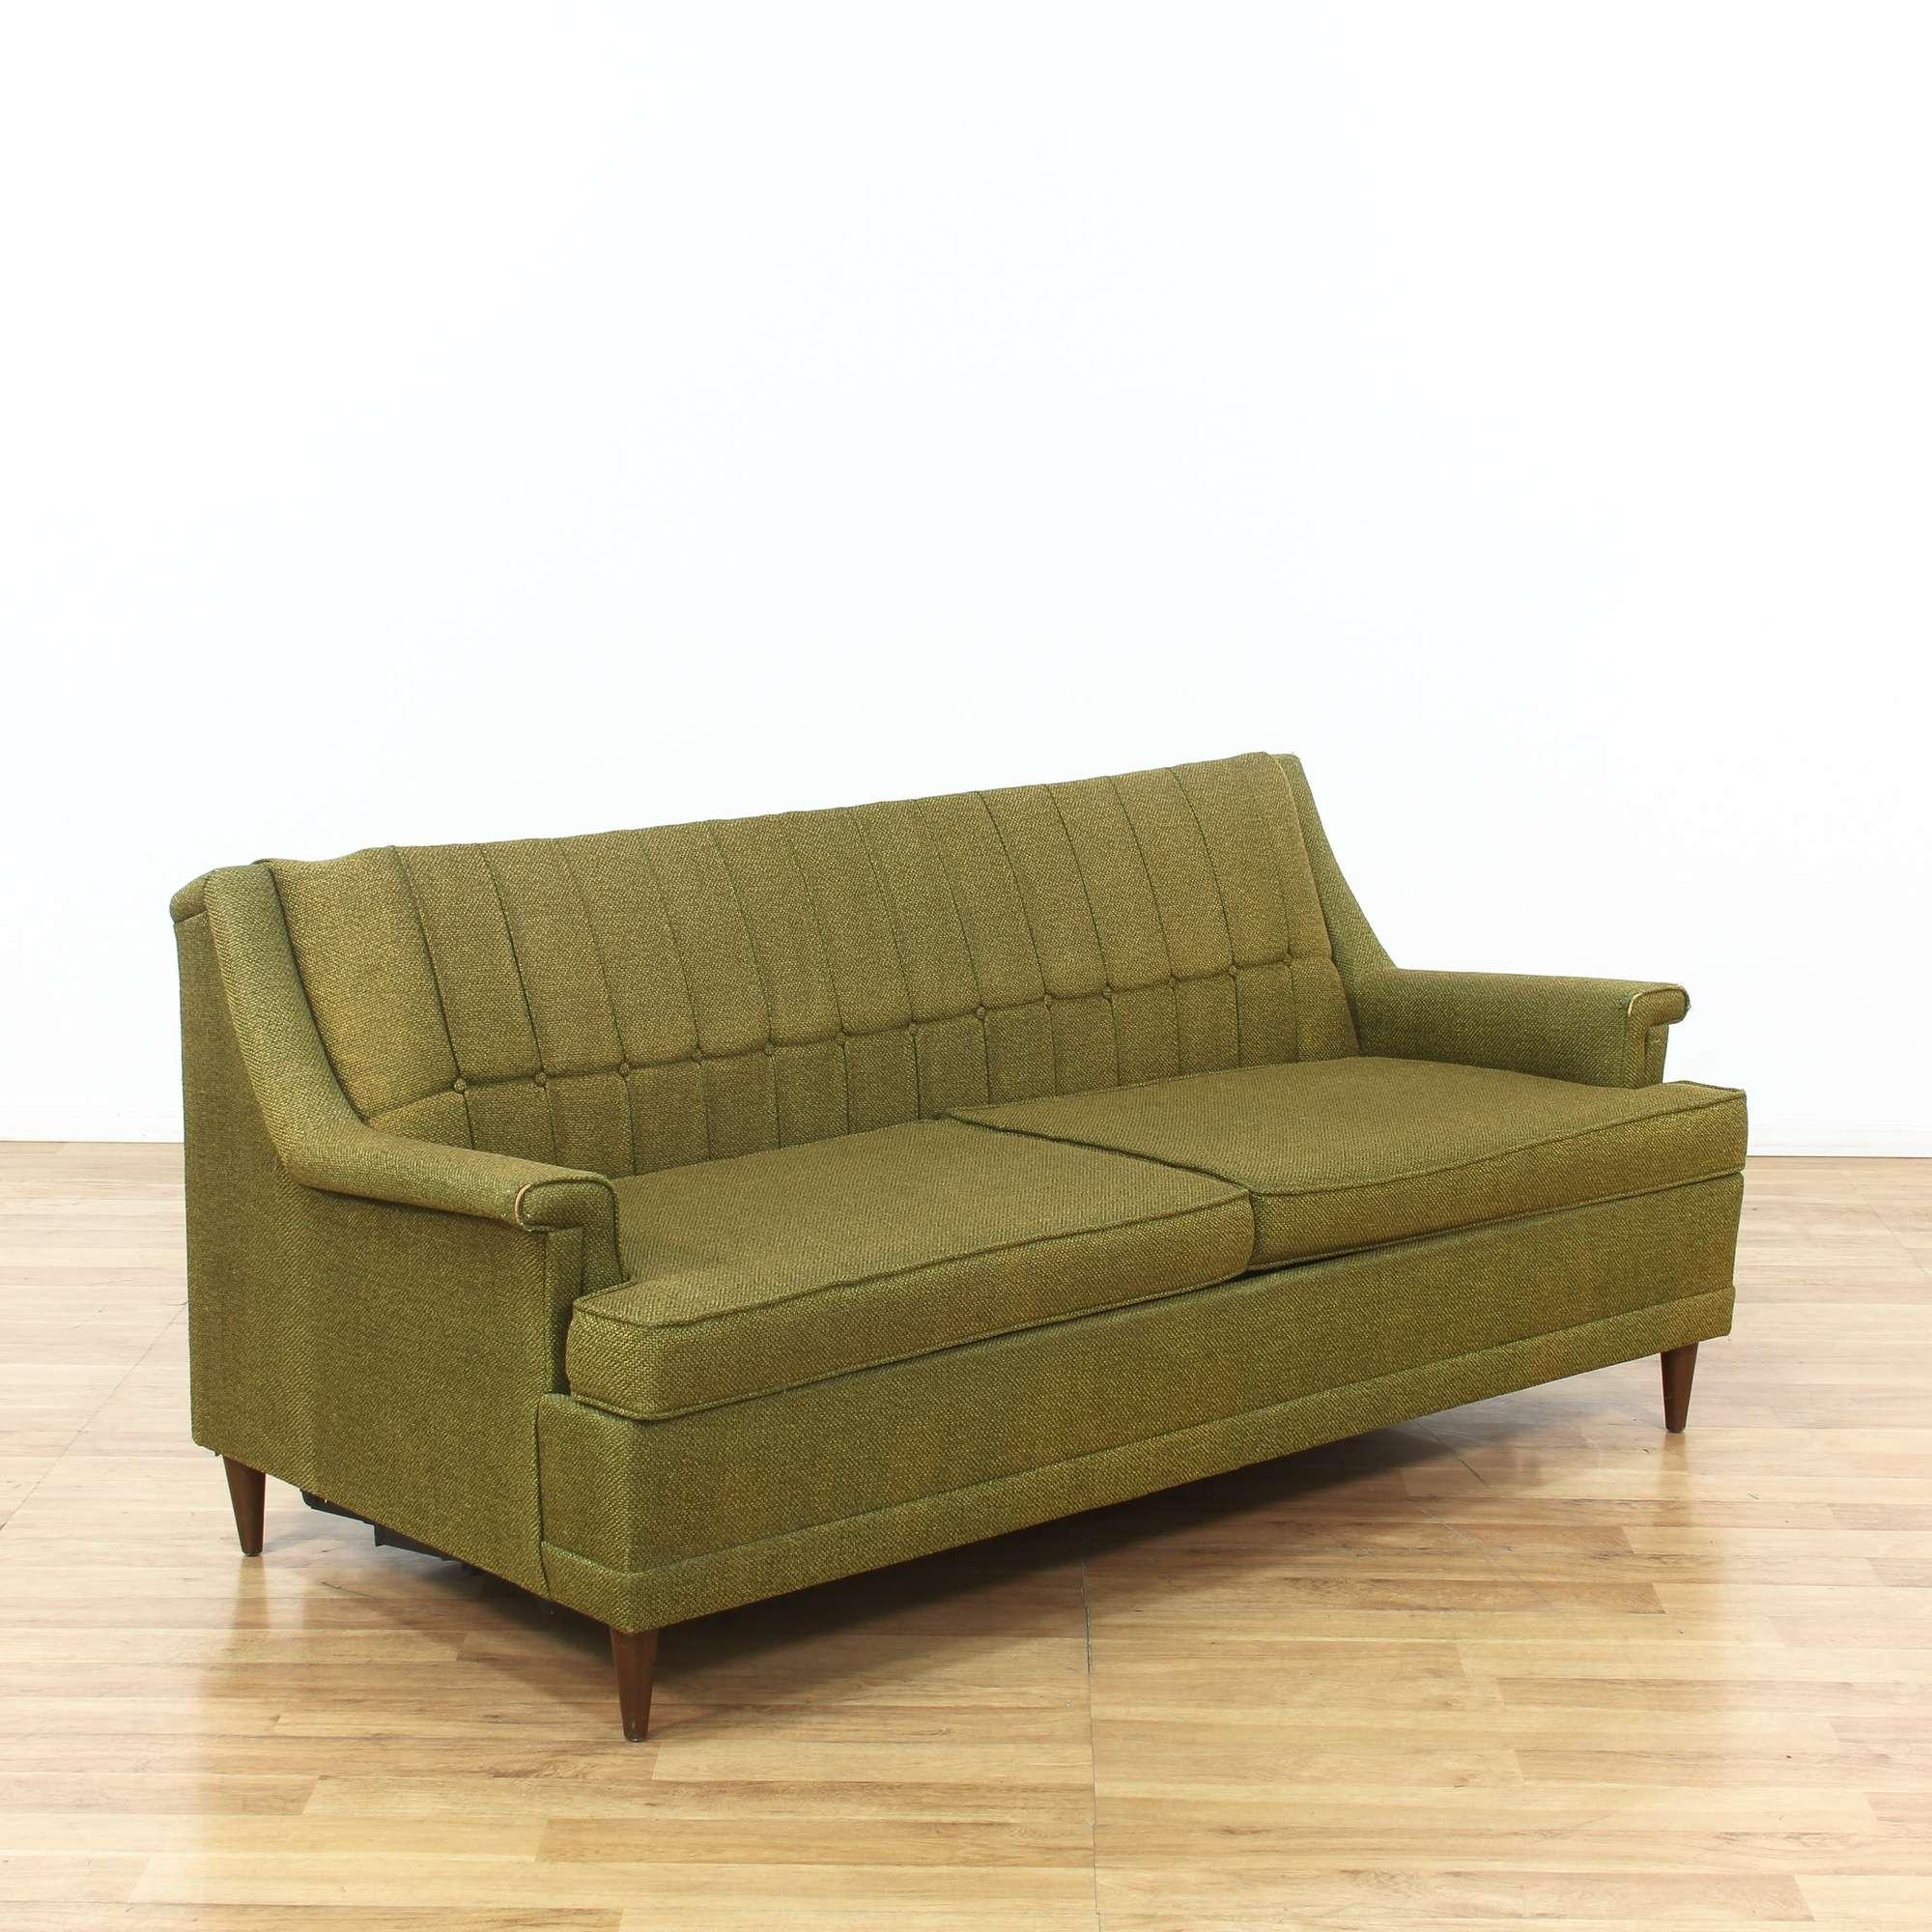 Kroehler Mid Century Modern Green Sleeper Sofa Loveseat